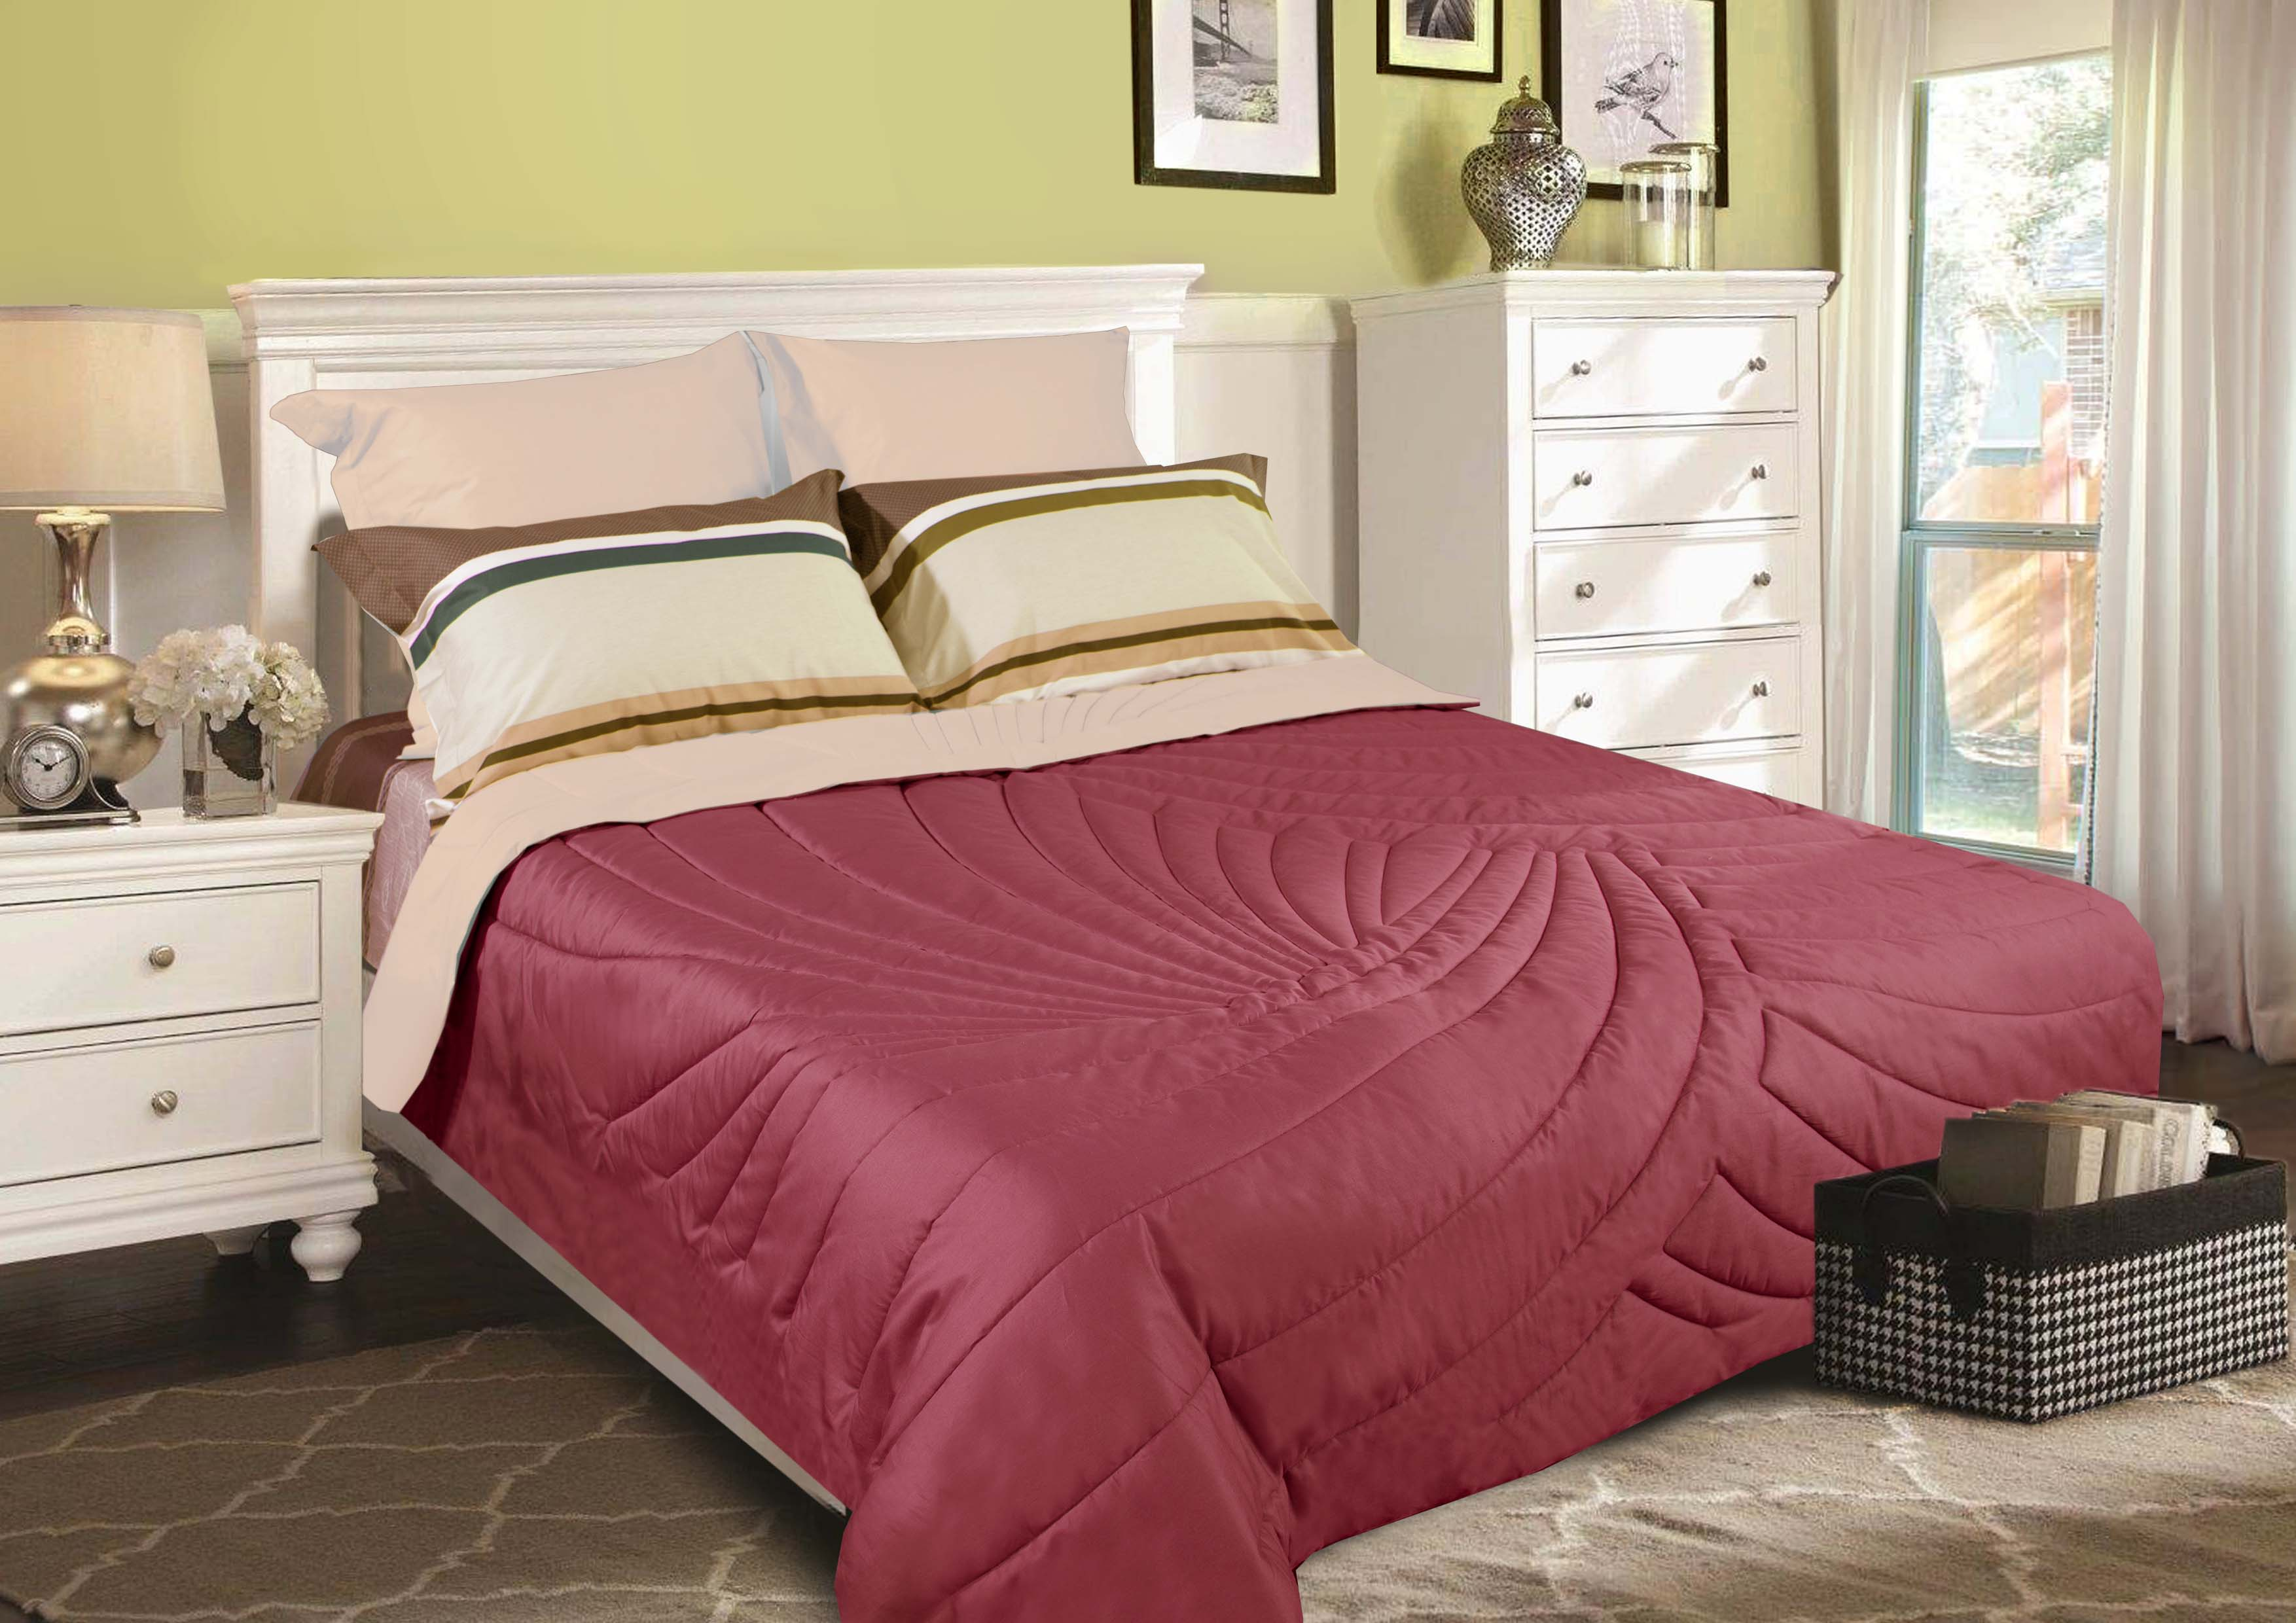 "Одеяло Primavelle покрывало ""Duo. Тропики"" 230 х 250 см, бордовый, светло-коричневый"